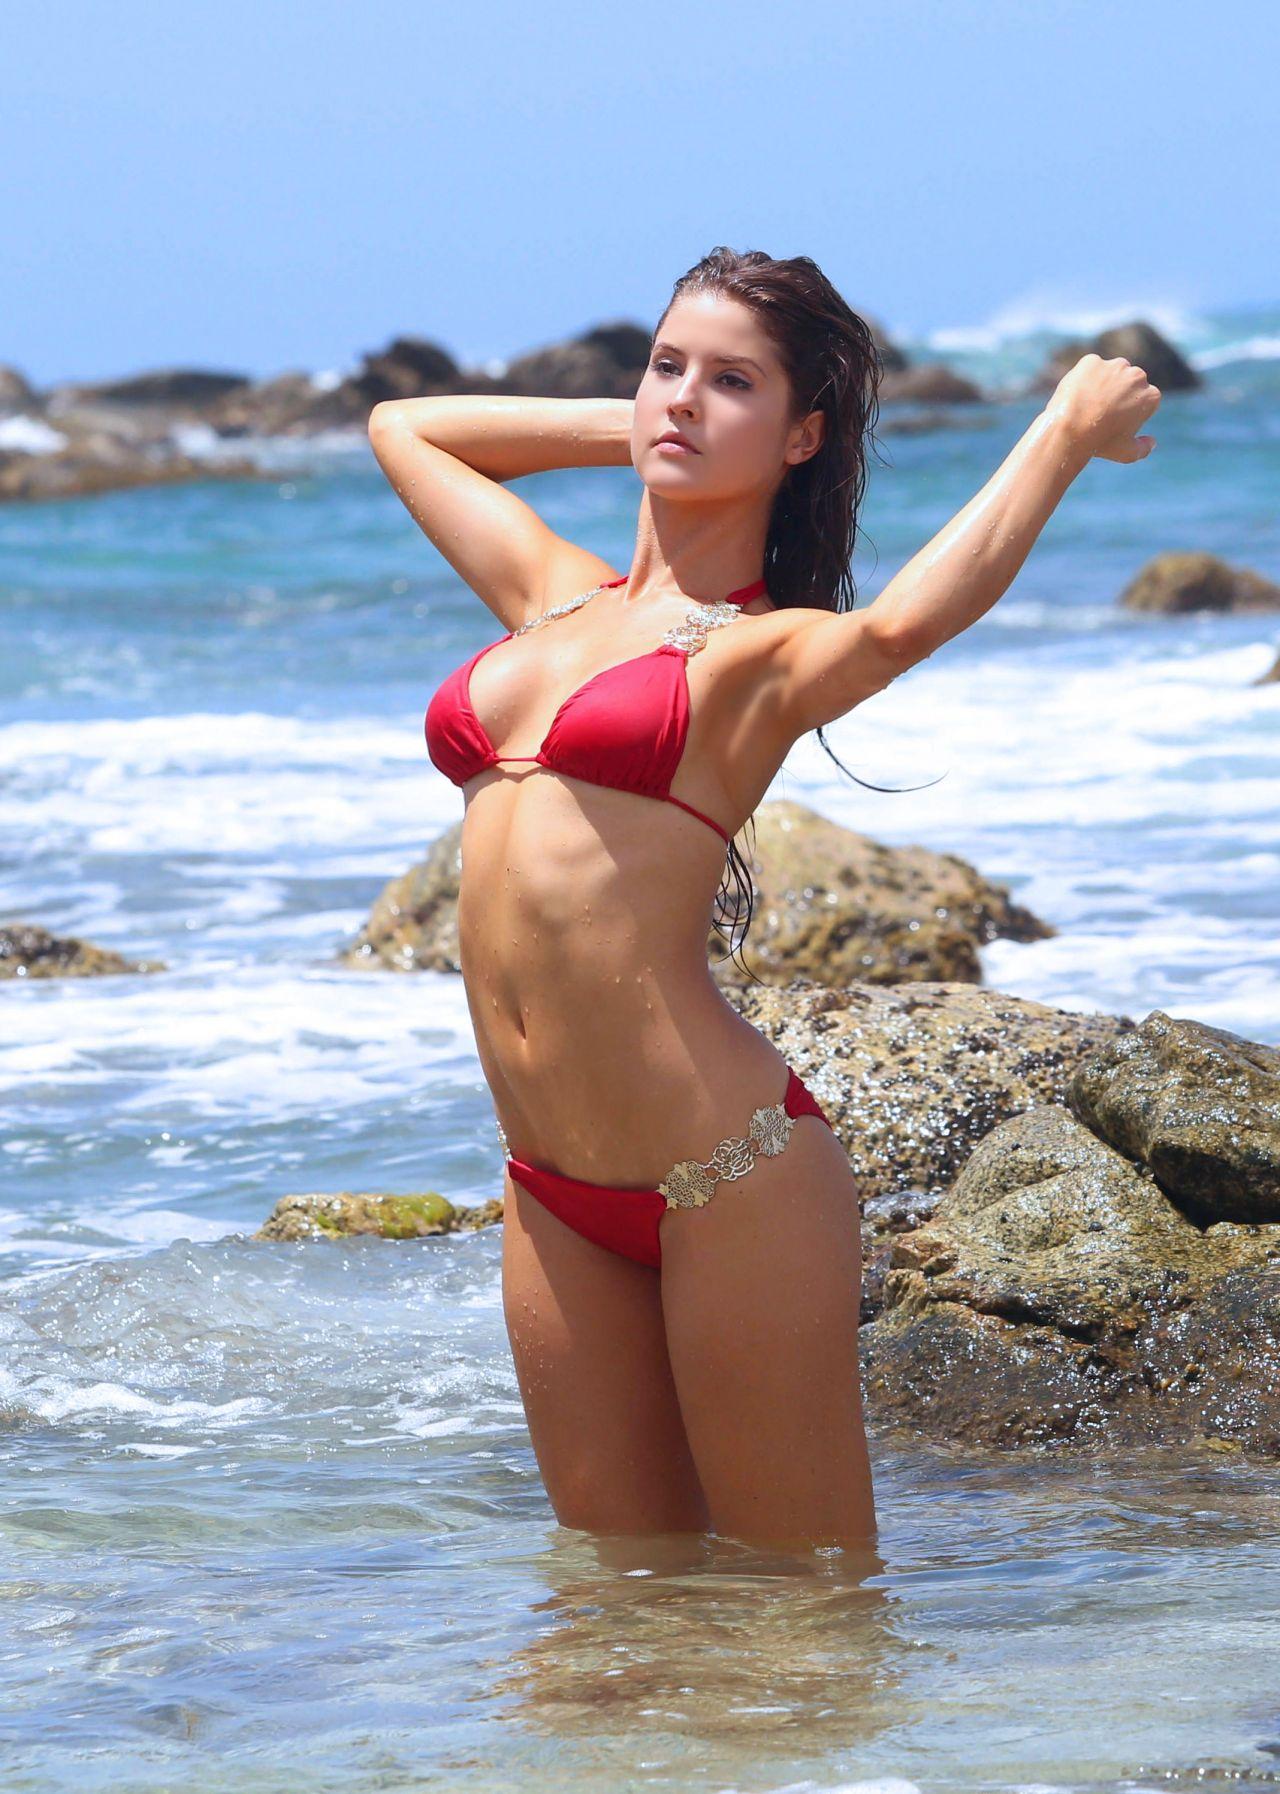 Amanda Cerny Bikini Photoshoot - on the Set of a Music ...